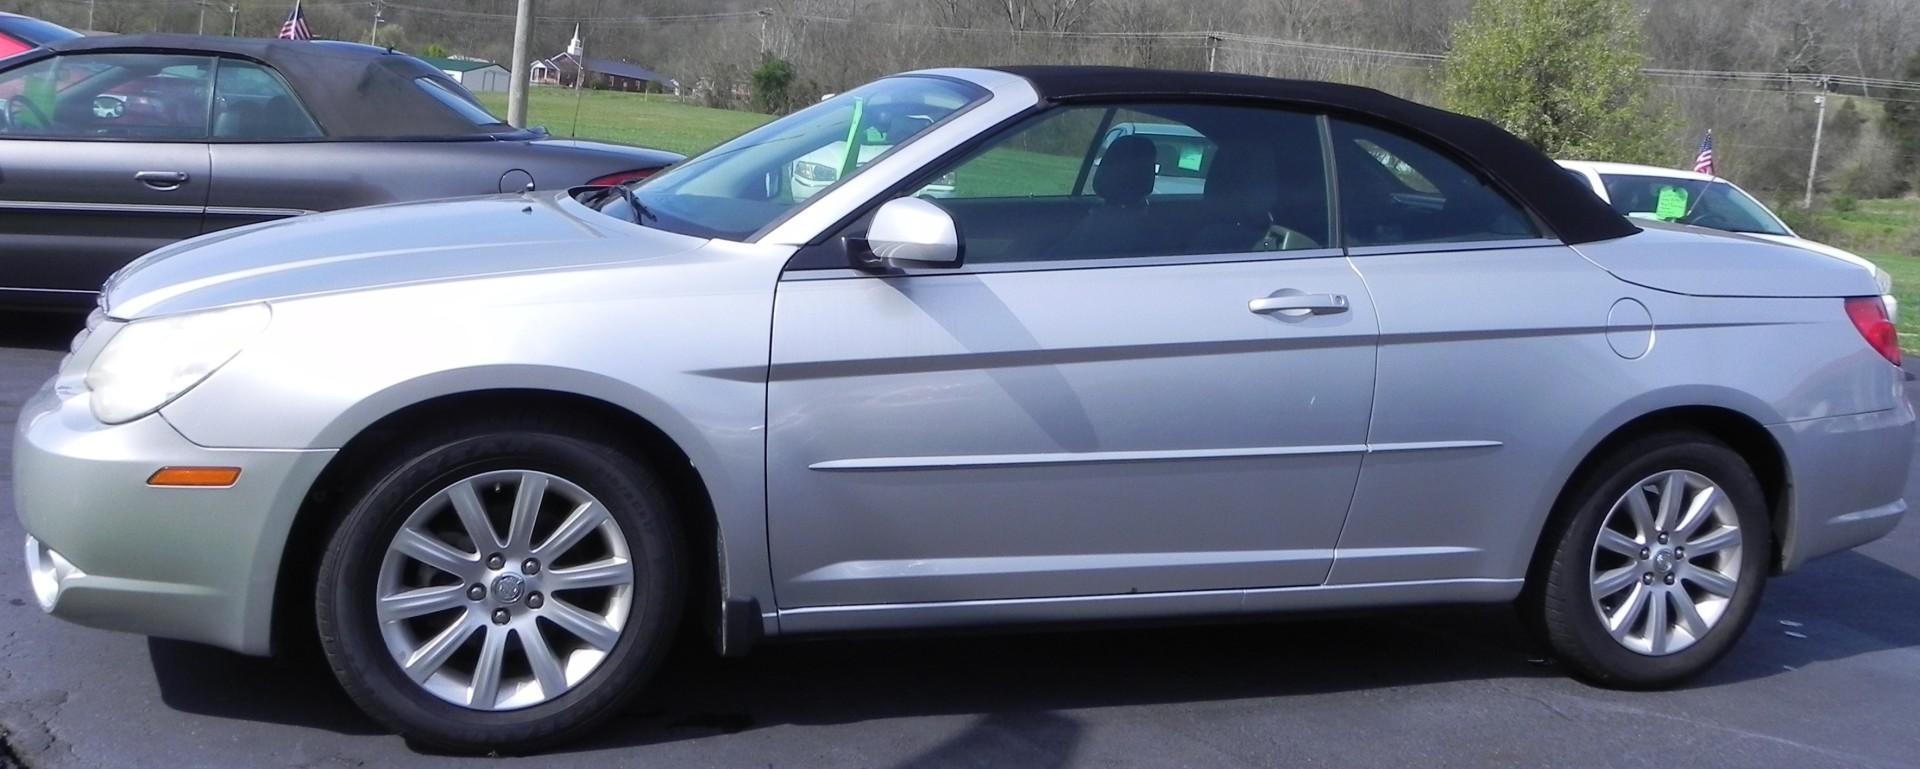 2010 Chrysler Sebring Convertible